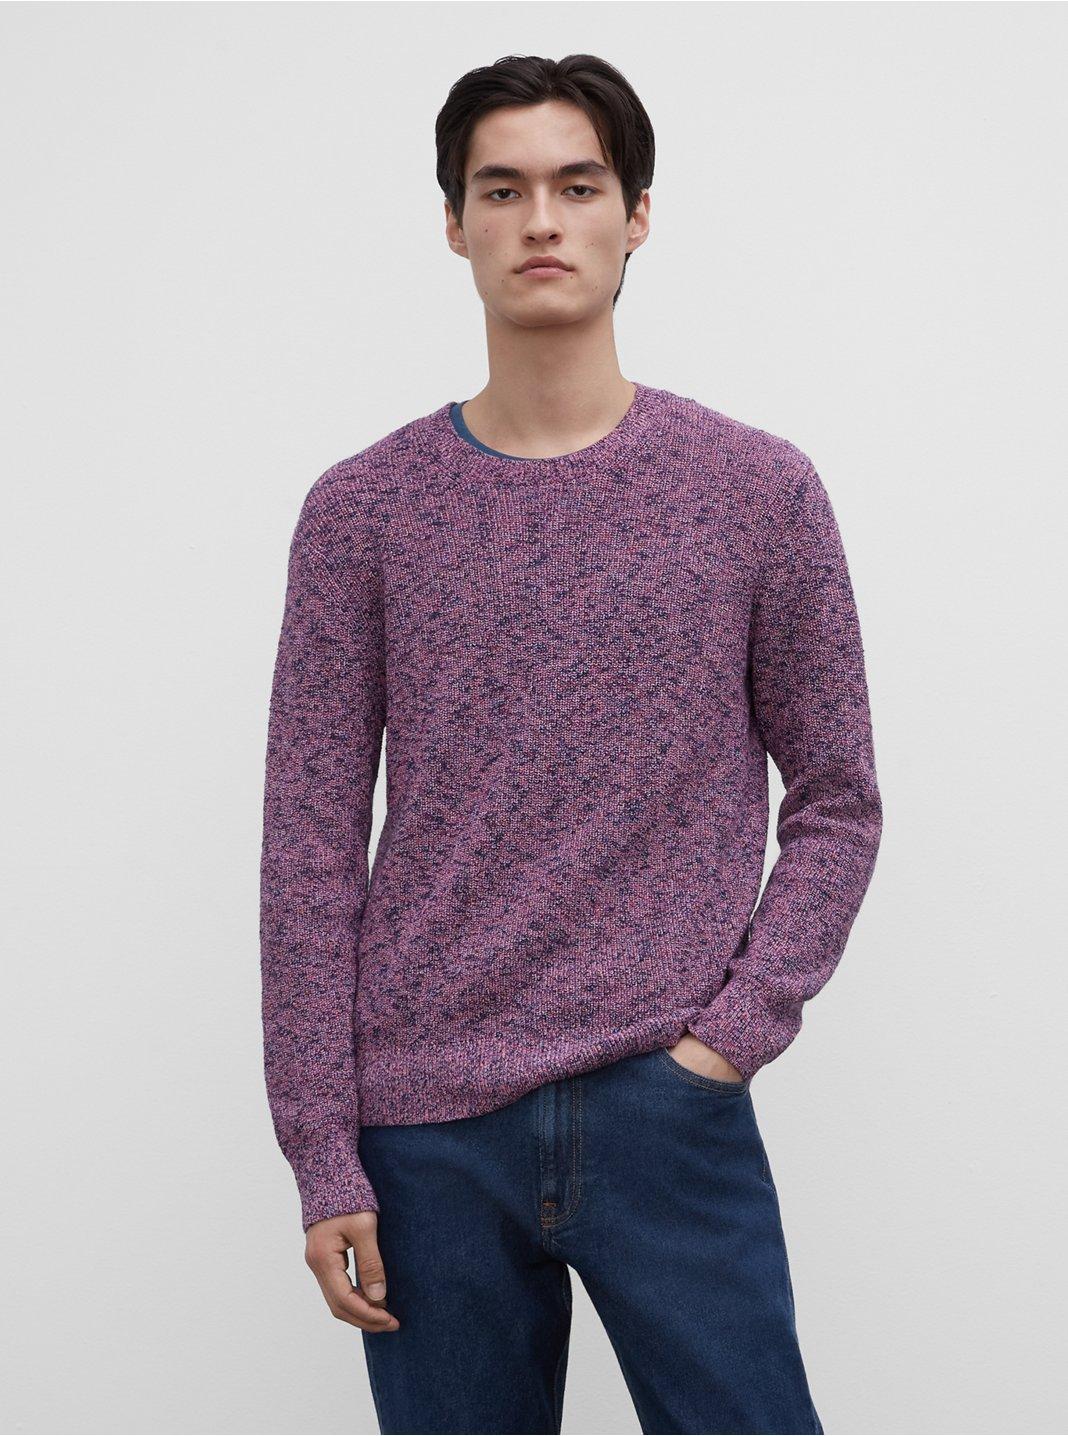 Long Sleeve Feel Good Crew Sweater